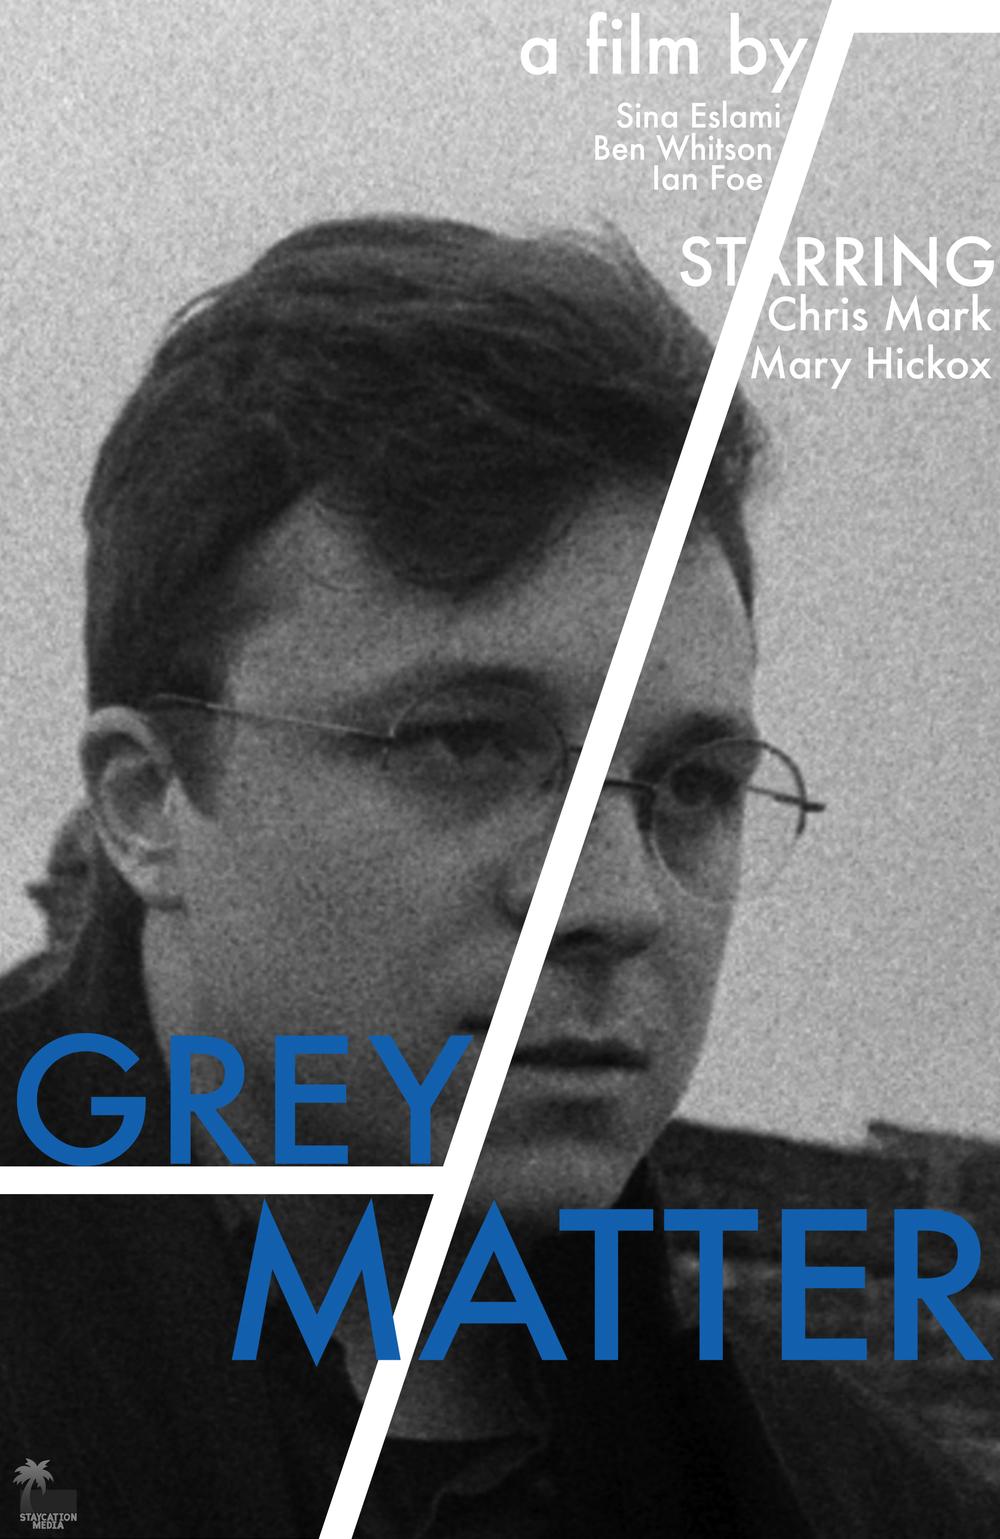 Grey Matter Poster.jpg